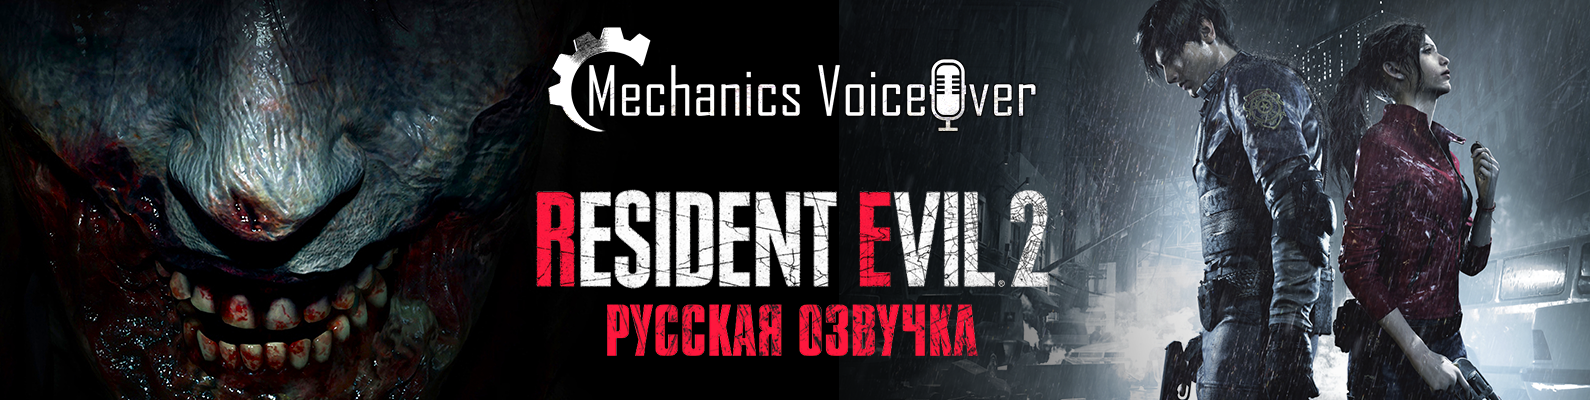 Resident Evil 2 - Первый тест русской озвучки от R.G. MVO